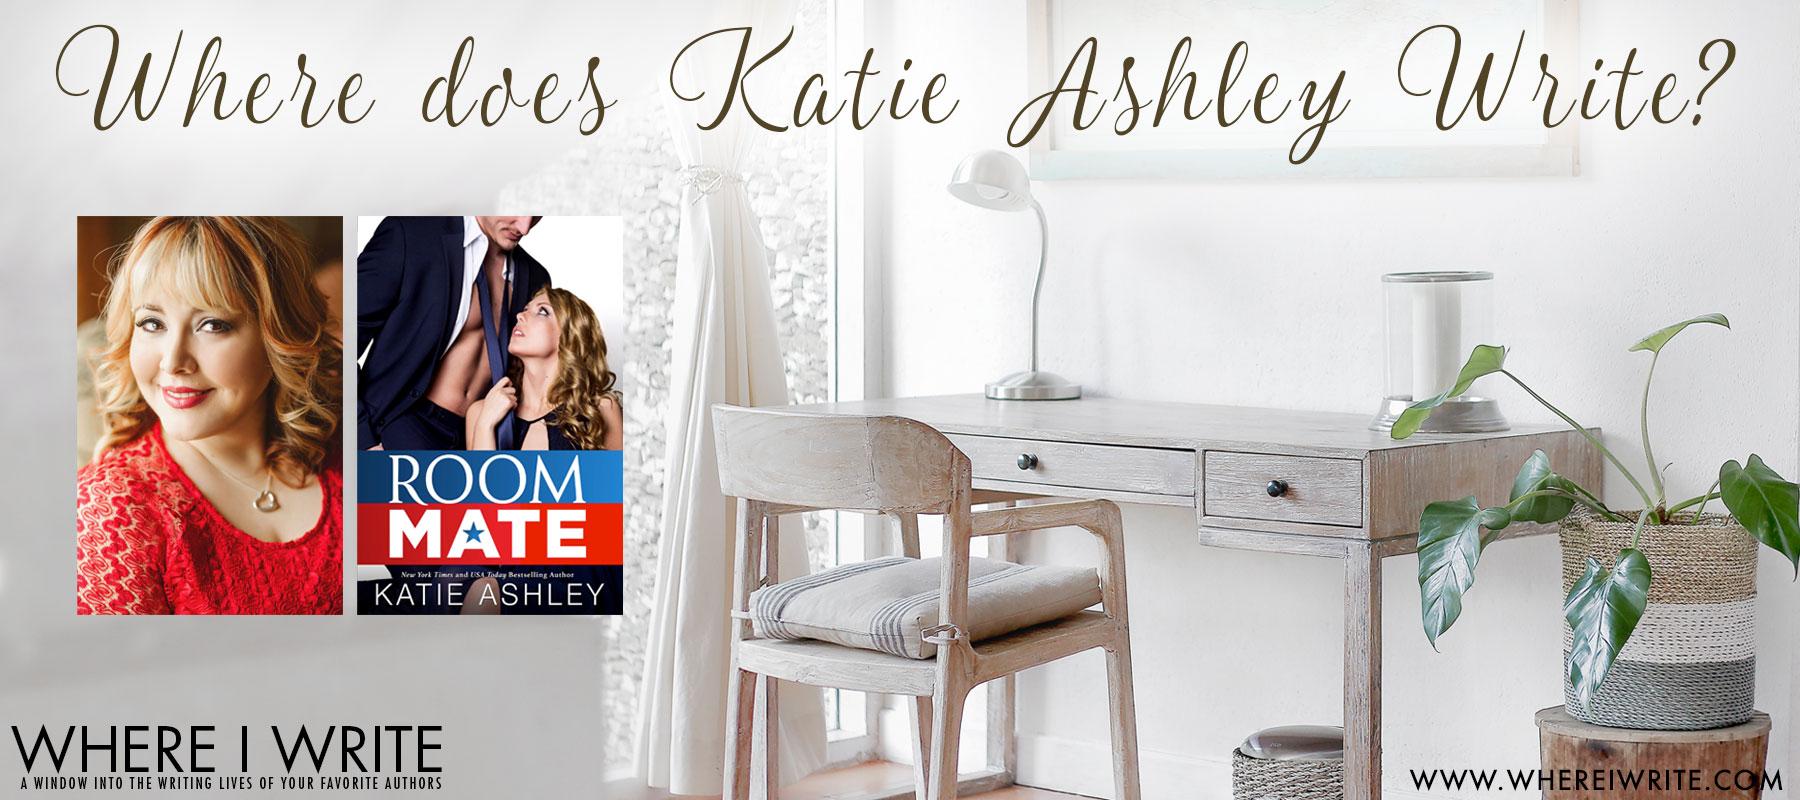 AuthorWrites-Template_nodate_KatieAshley.jpg